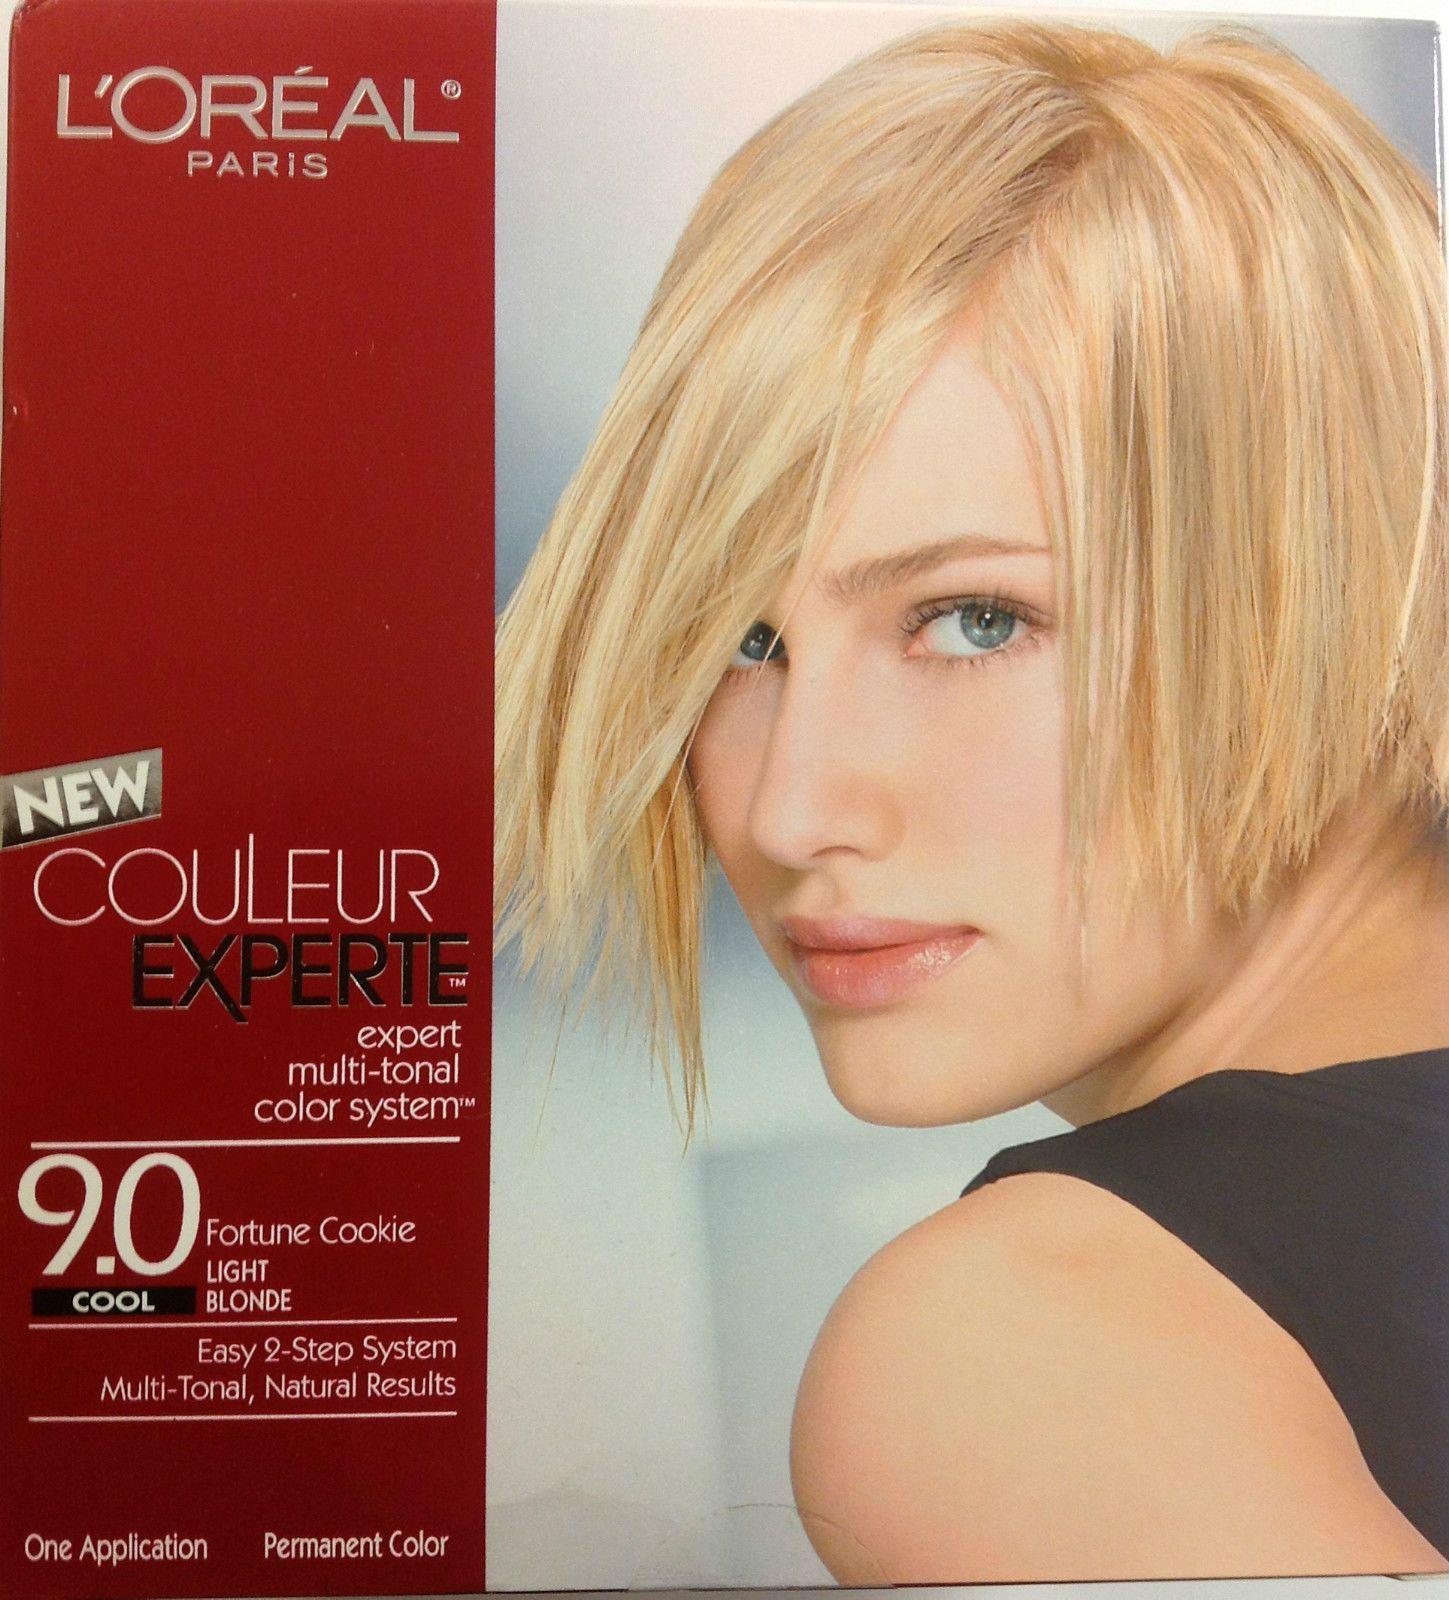 Loreal Couleur Experte Expert Multi Tonal Hair Color Light Blonde